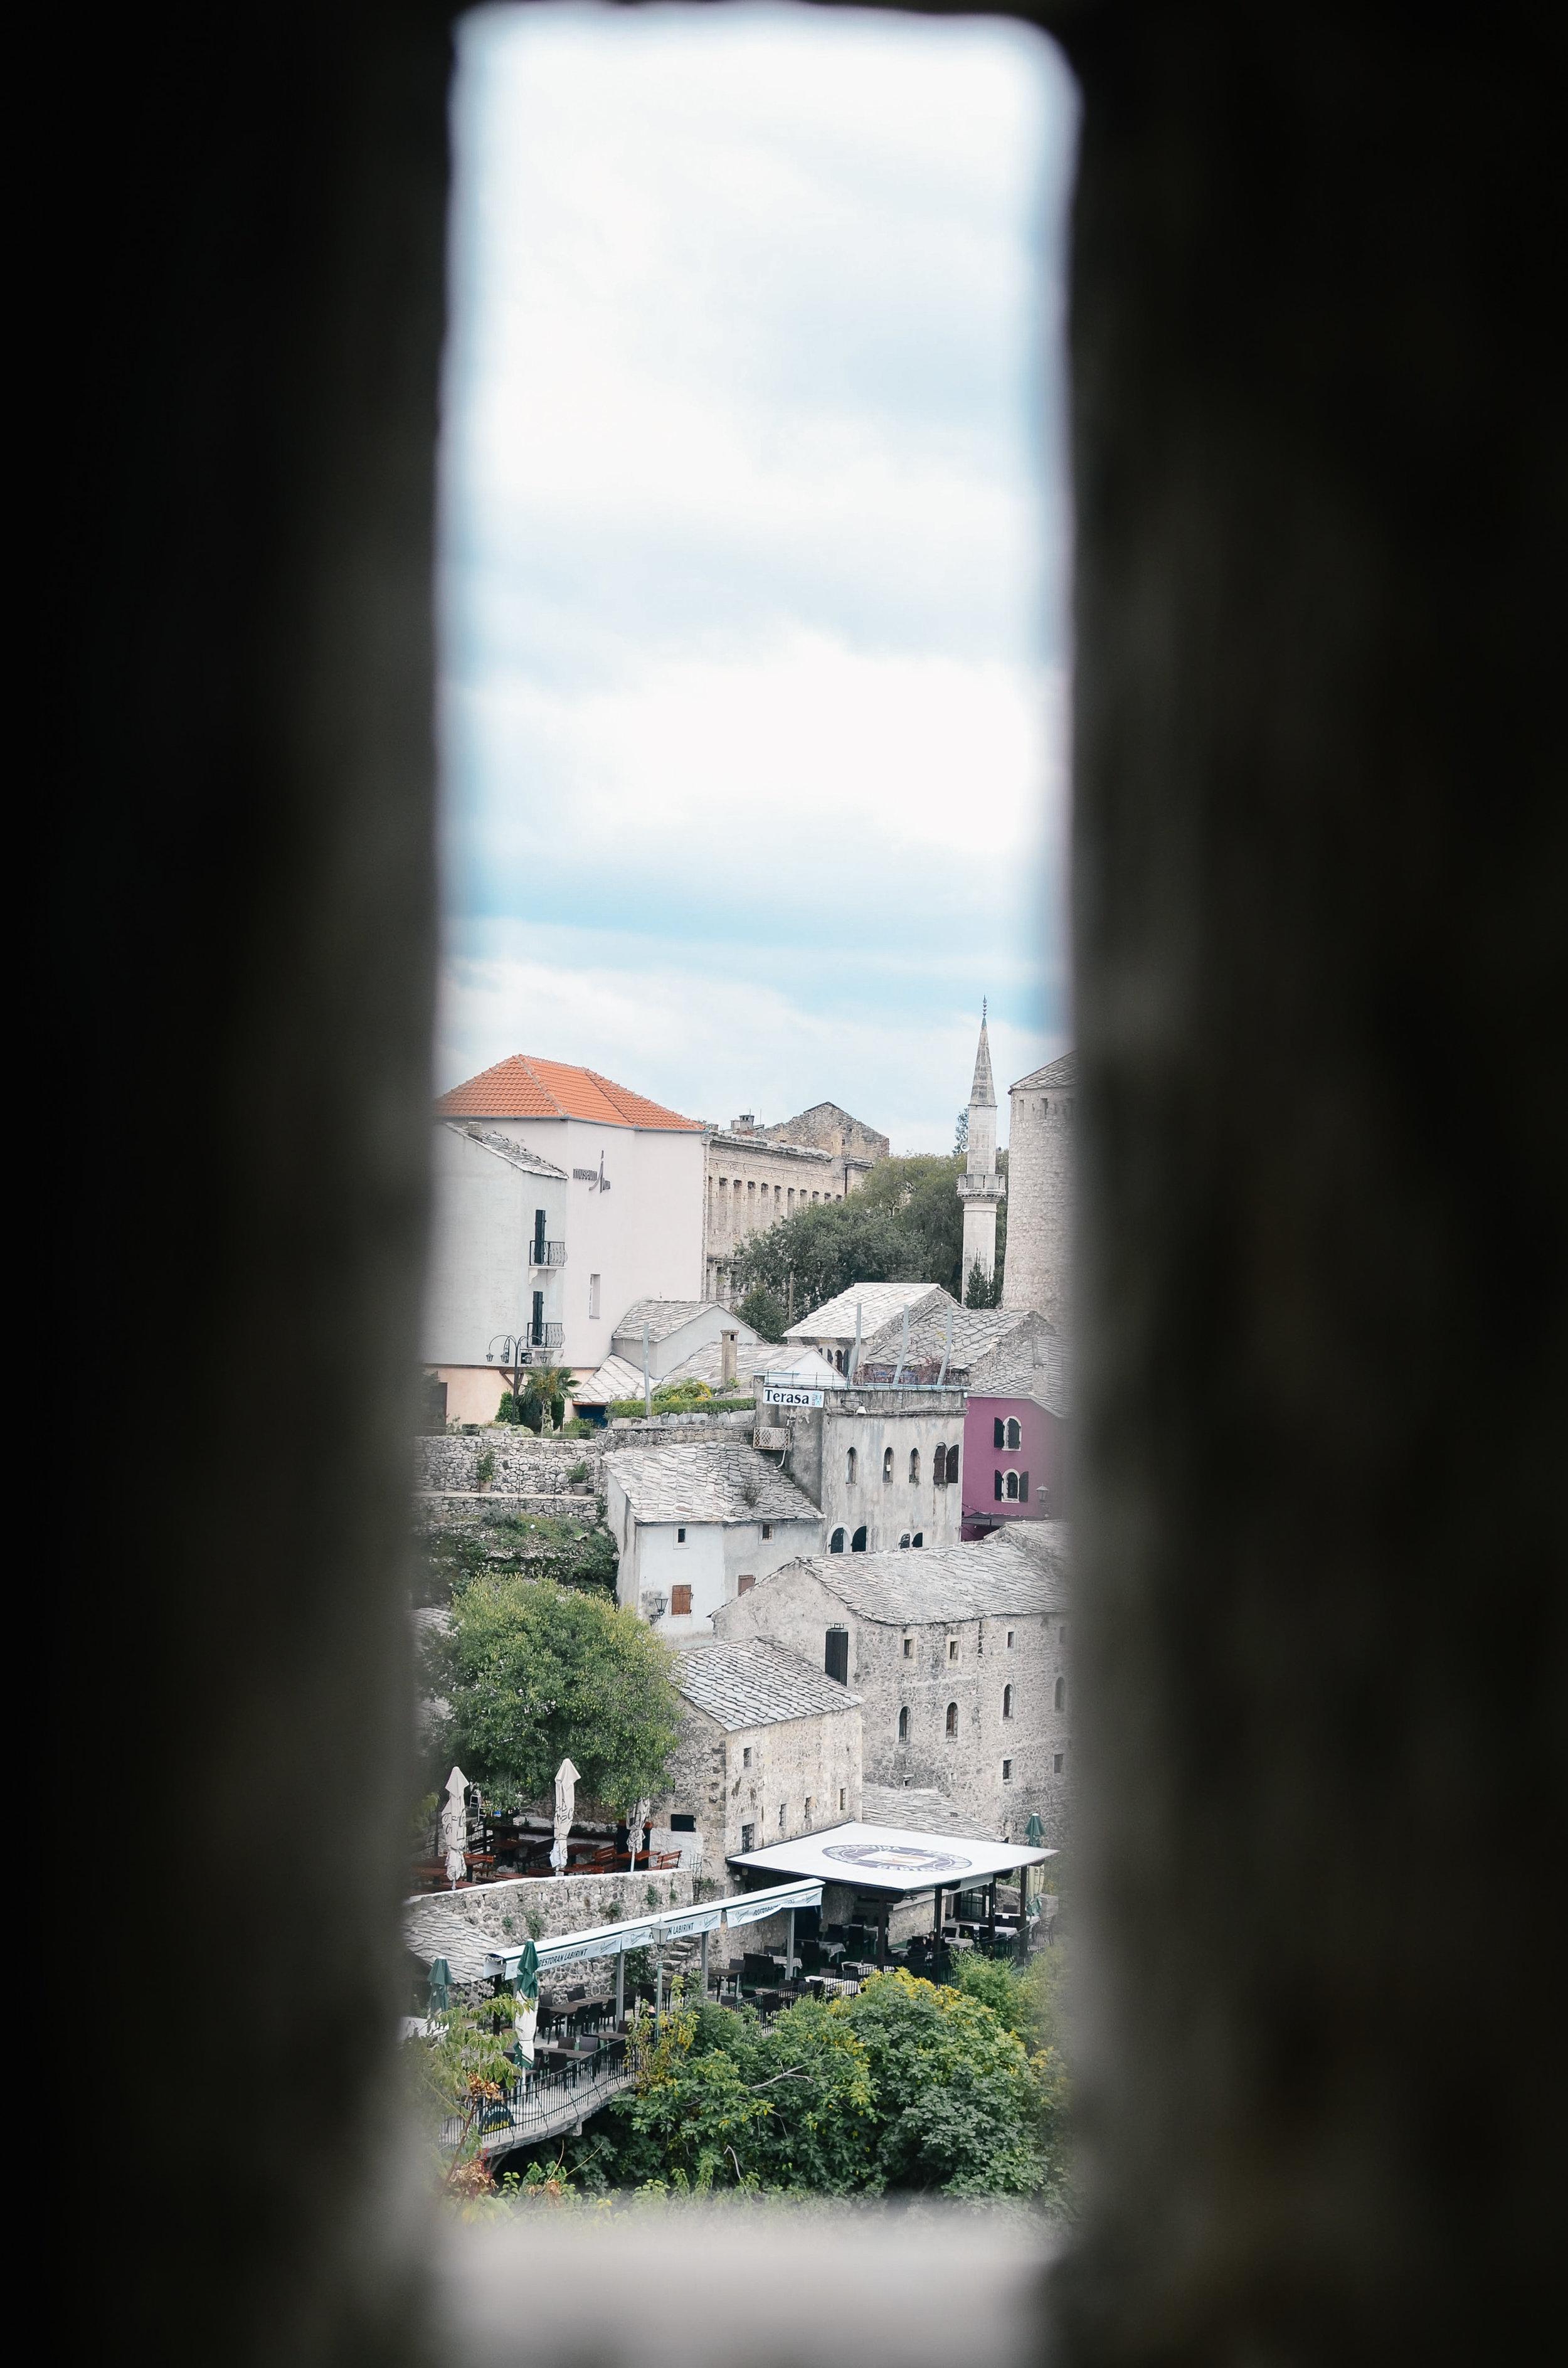 mostar-bosnia-travel-guide-lifeonpine_DSC_3180.jpg